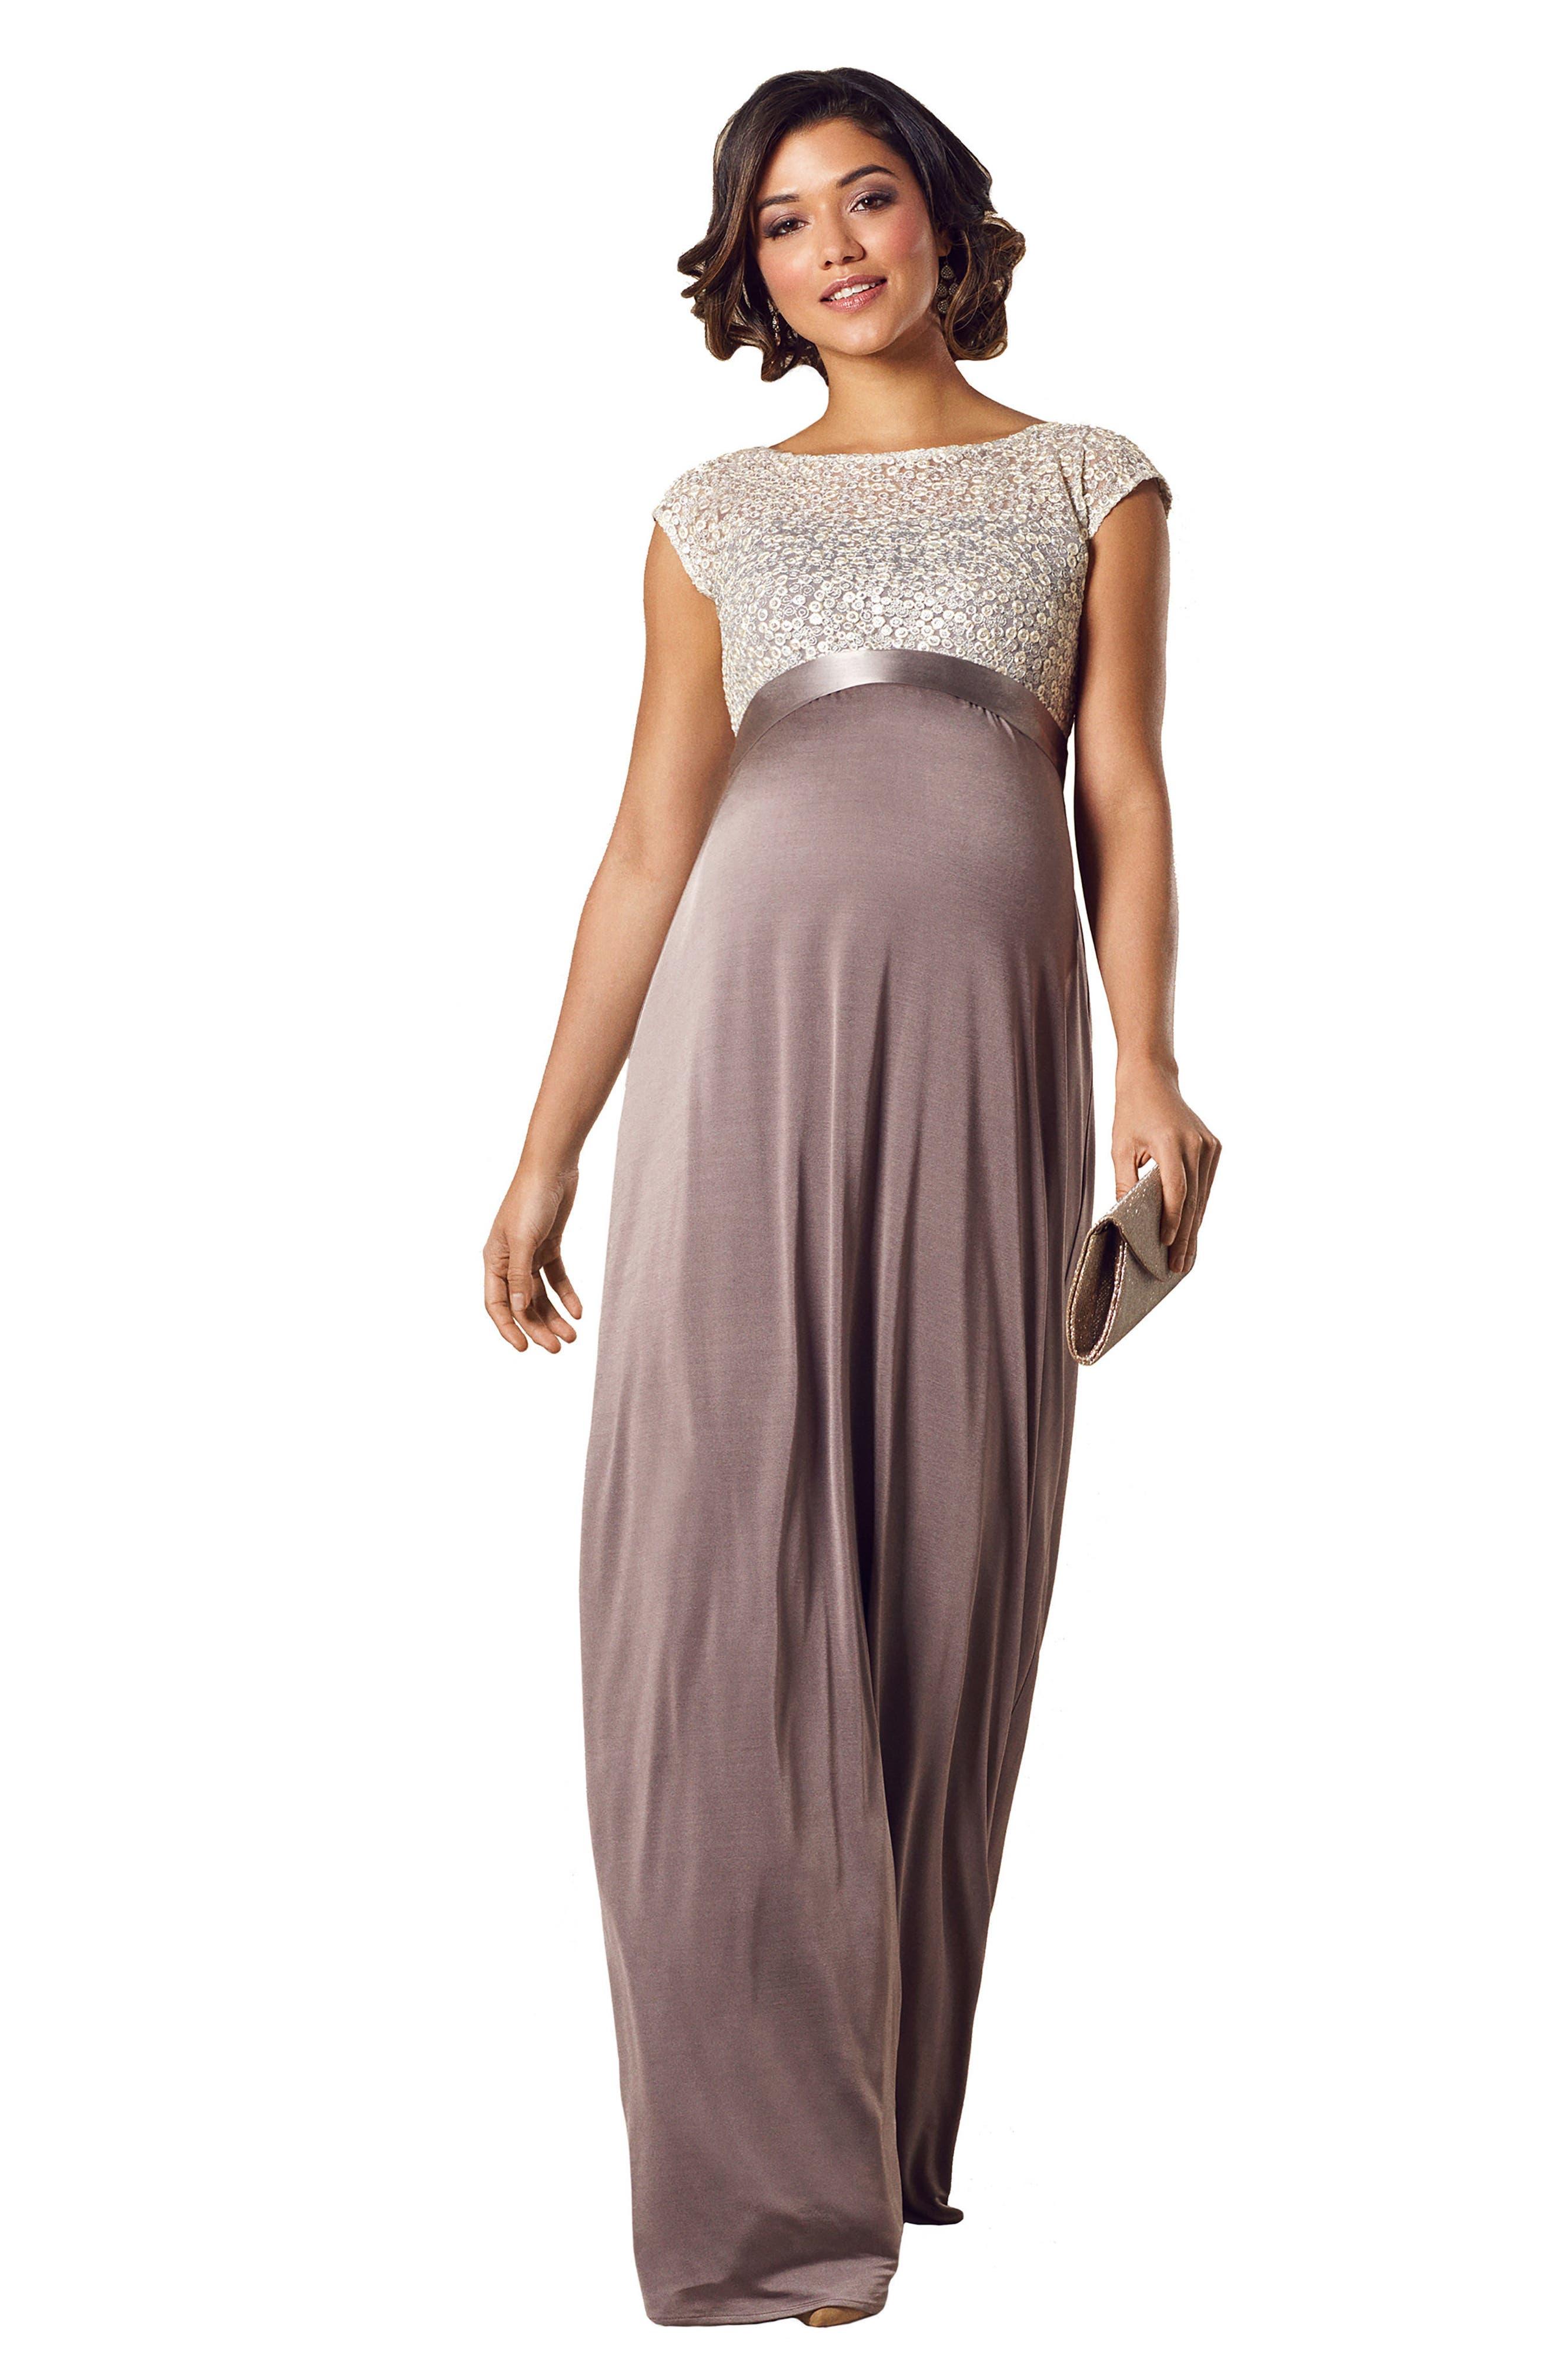 Mia Maternity Gown,                             Alternate thumbnail 4, color,                             DUSKY TRUFFLE